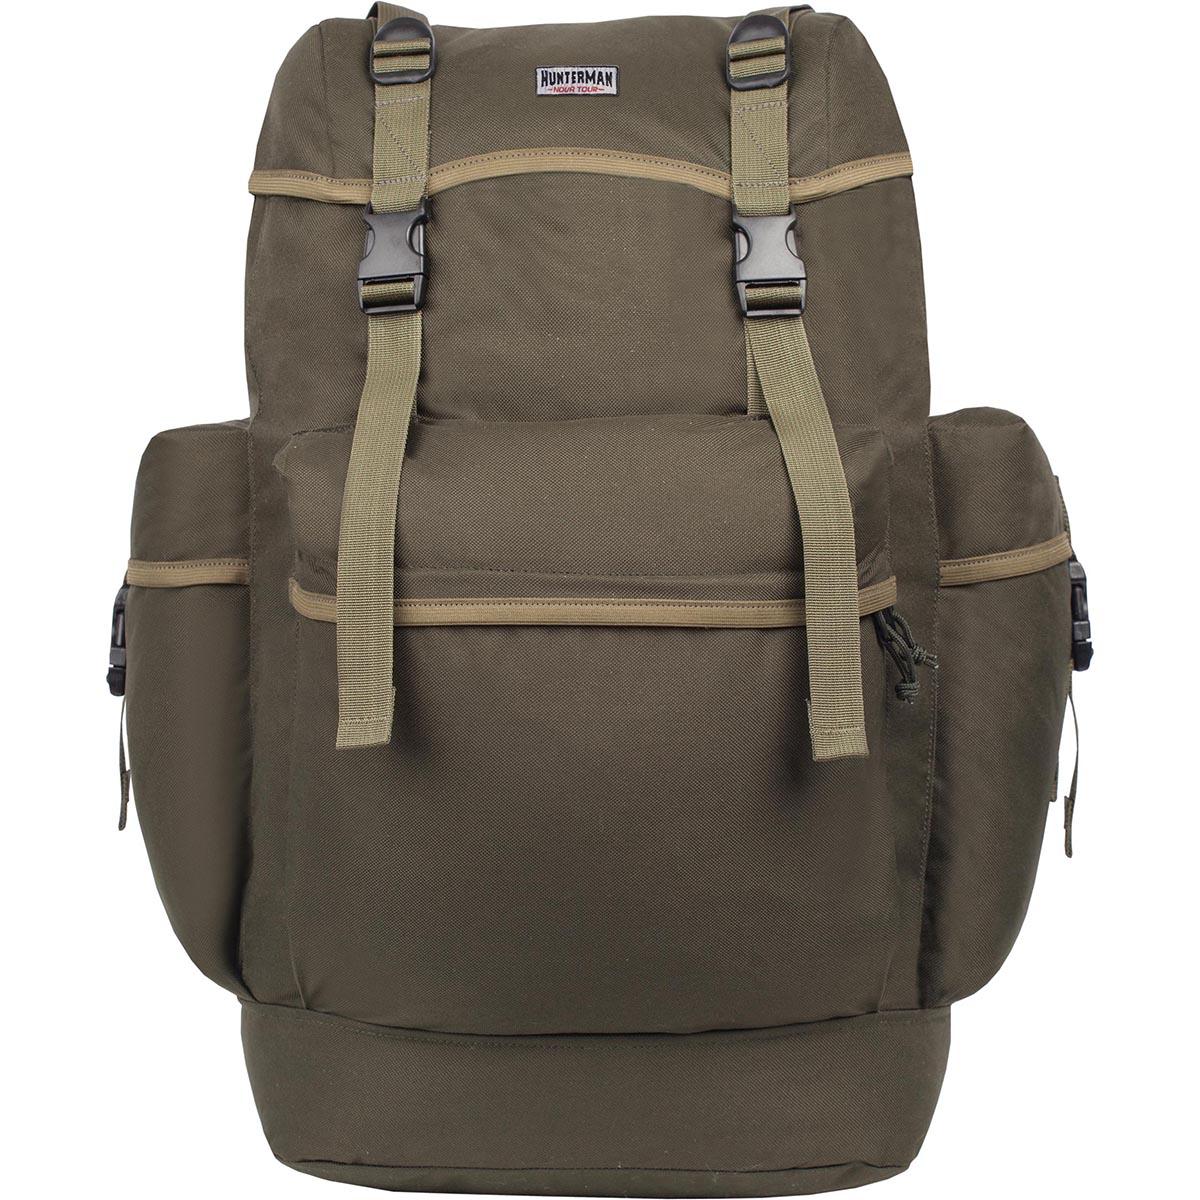 Рюкзак для охоты Hunter Nova Tour  Охотник 50 V3 , цвет: зеленый, 50 л - Охота